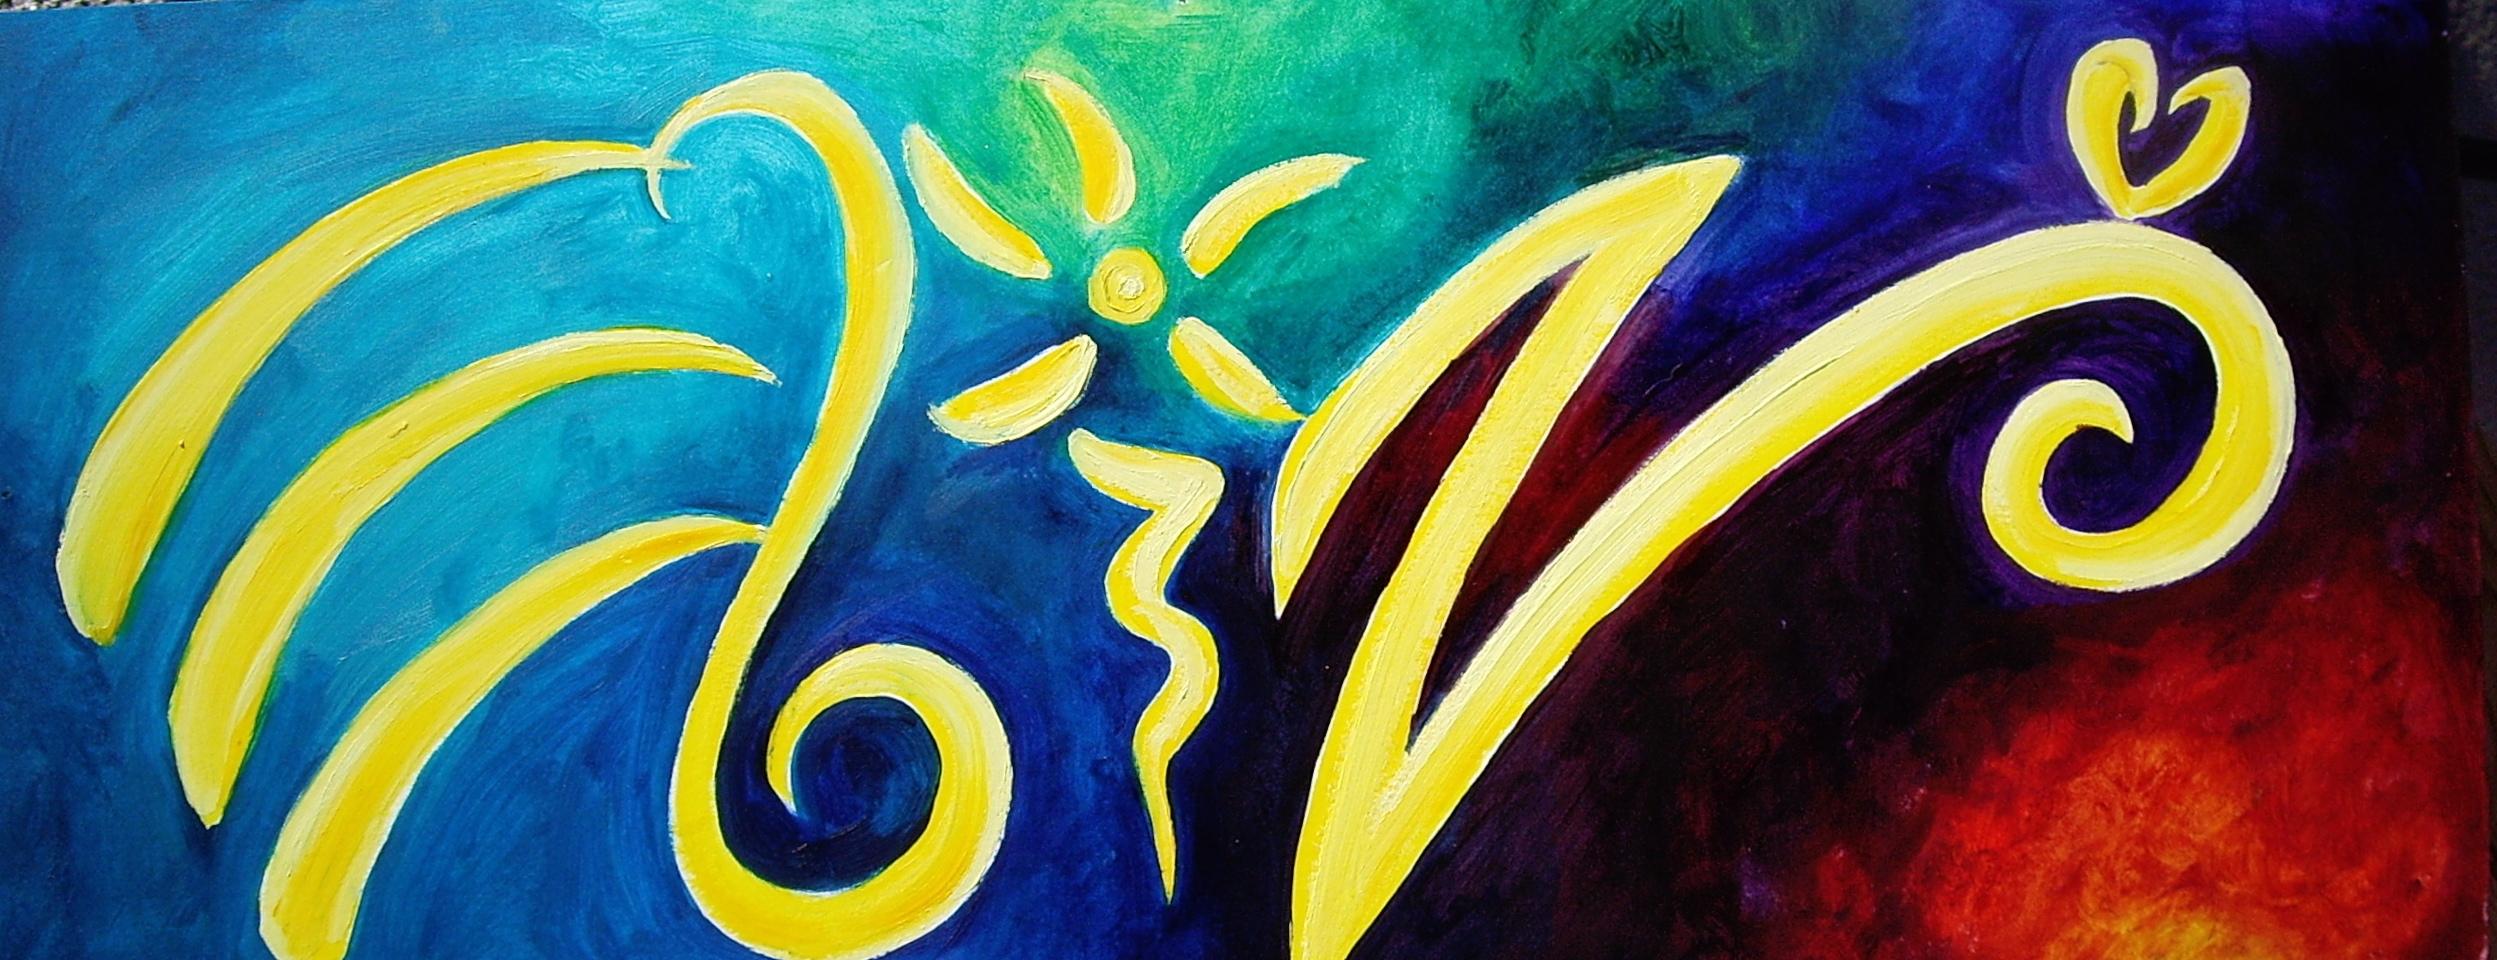 Eliza Furmansky's signature- colorful calligraphy